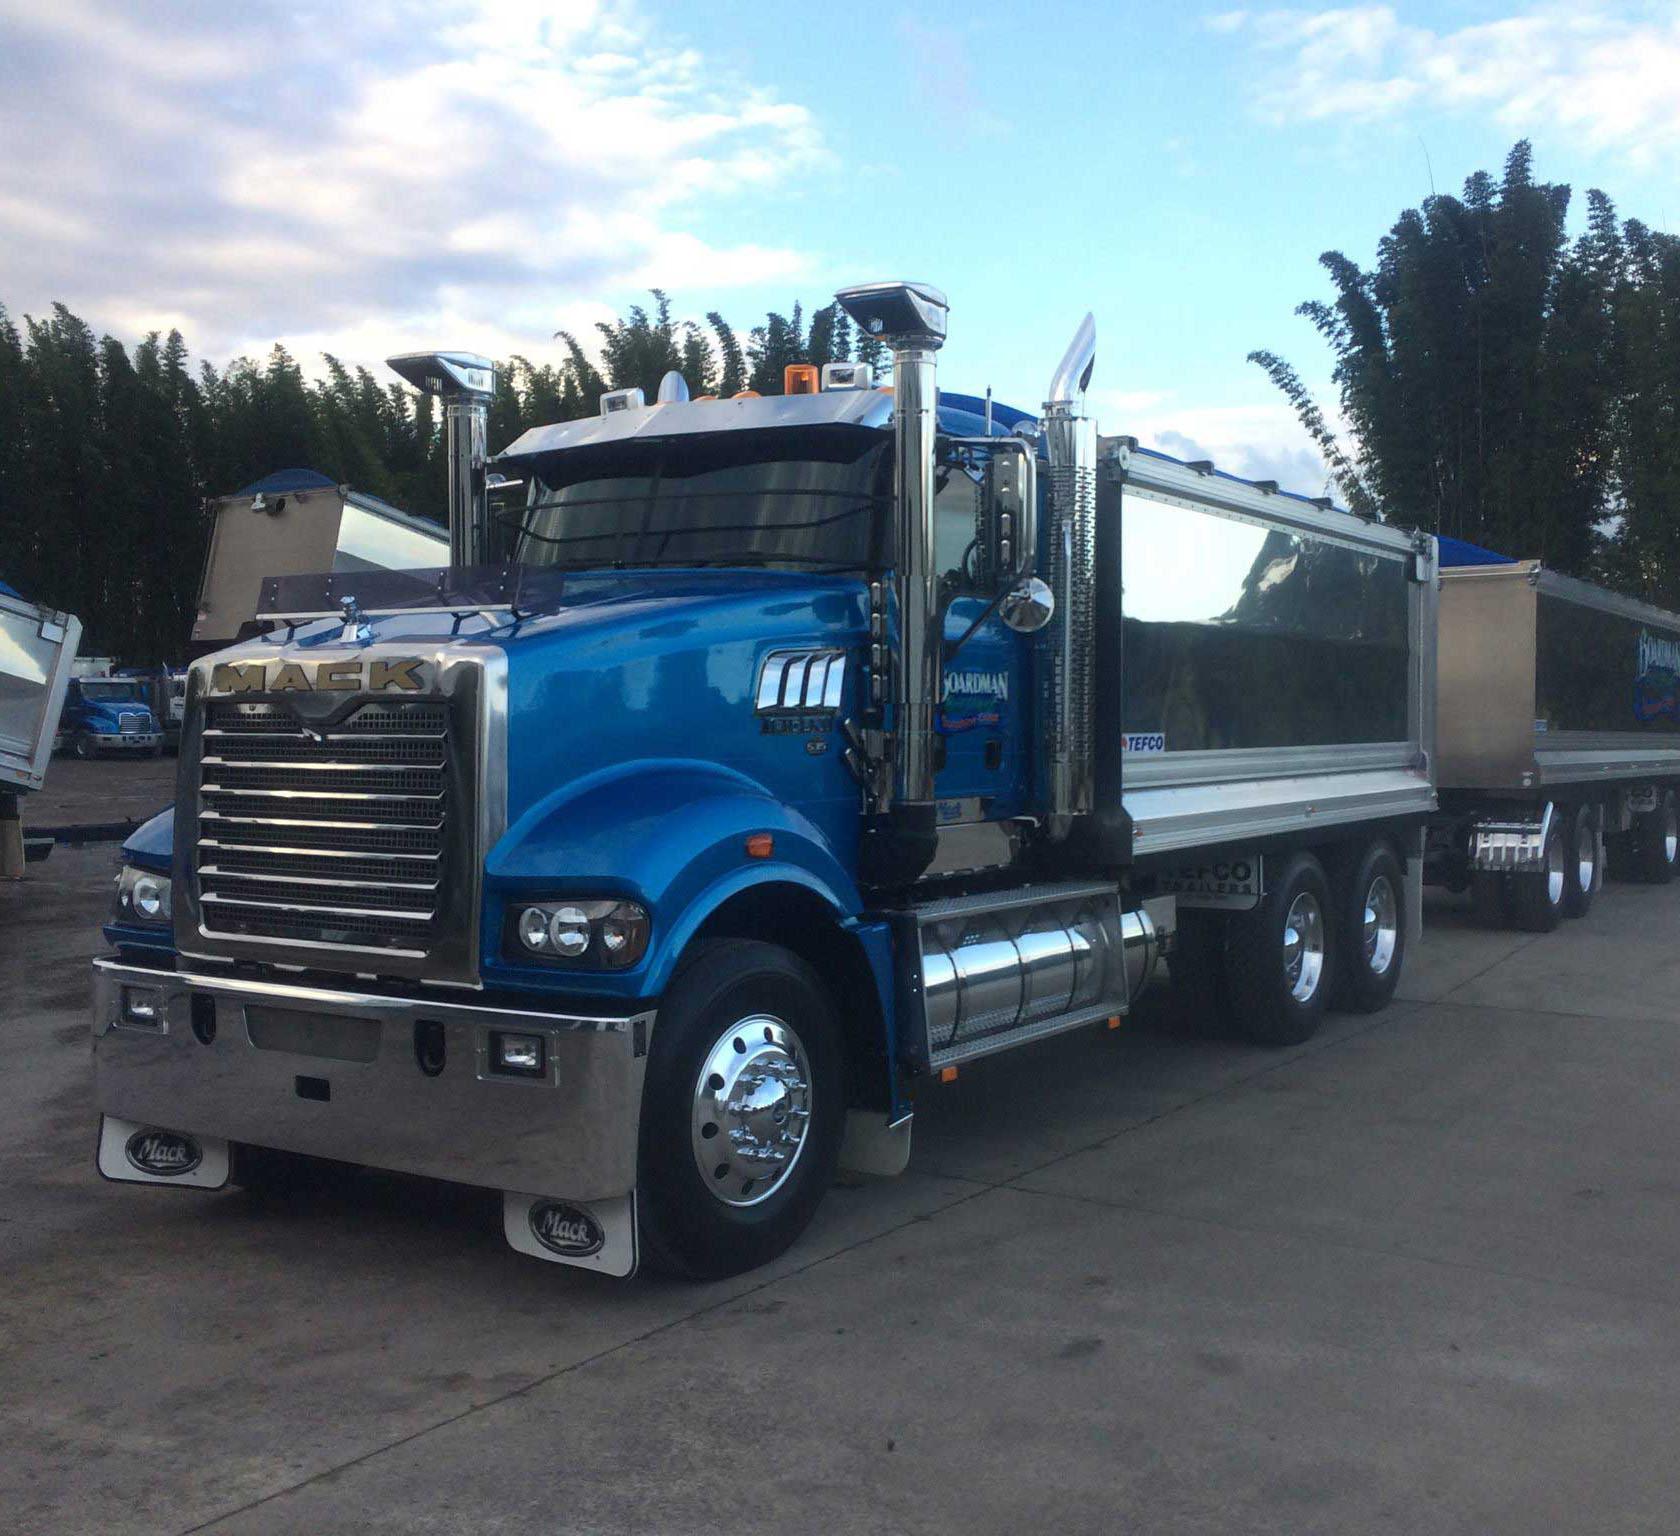 JLB80 Mack Trident Truck and Dog